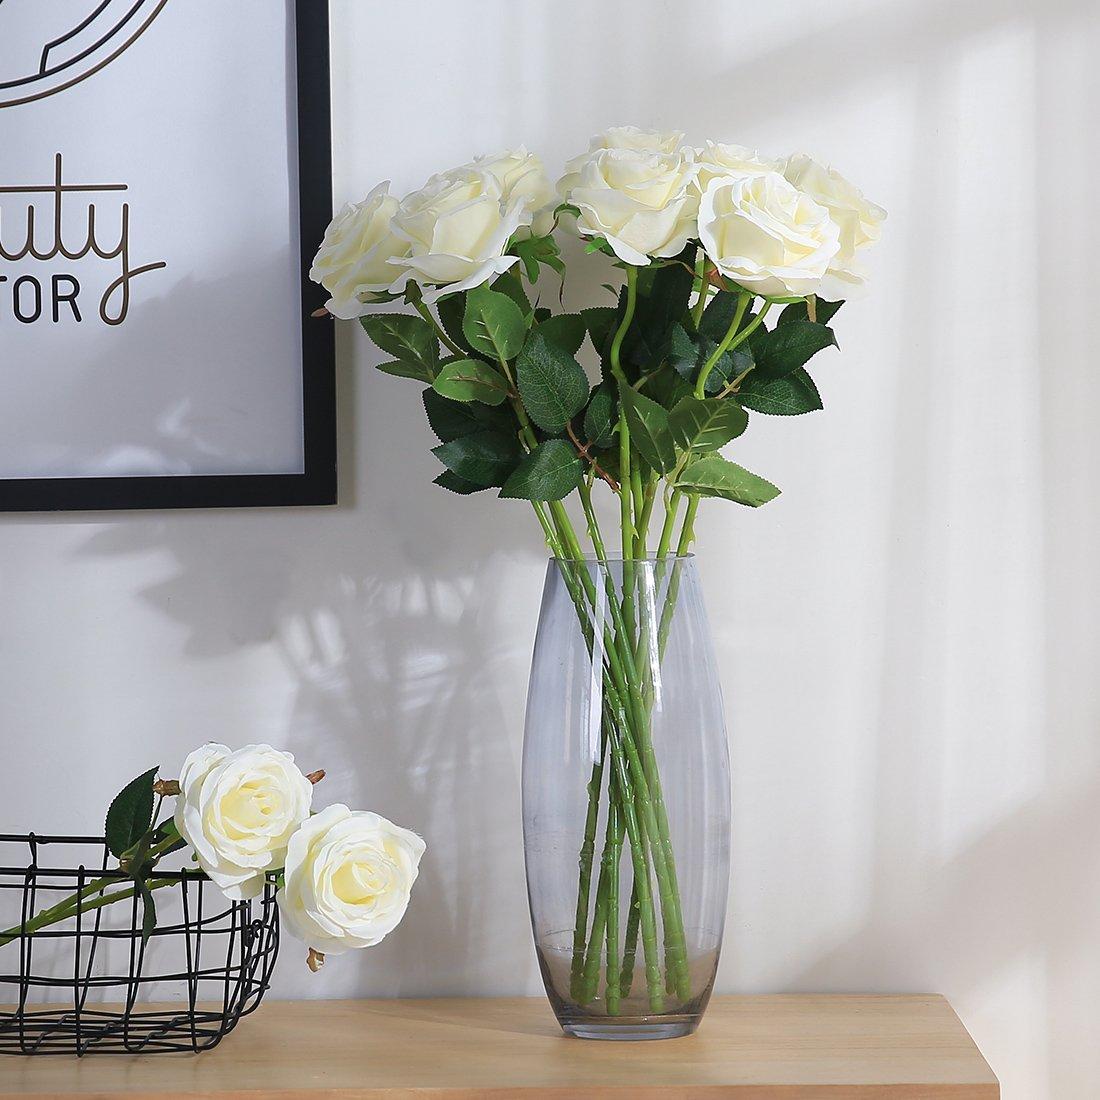 JUSTOYOU 10pcs Artificial Rose Silk Flower Blossom Bridal Bouquet for Home Wedding Decor(White)